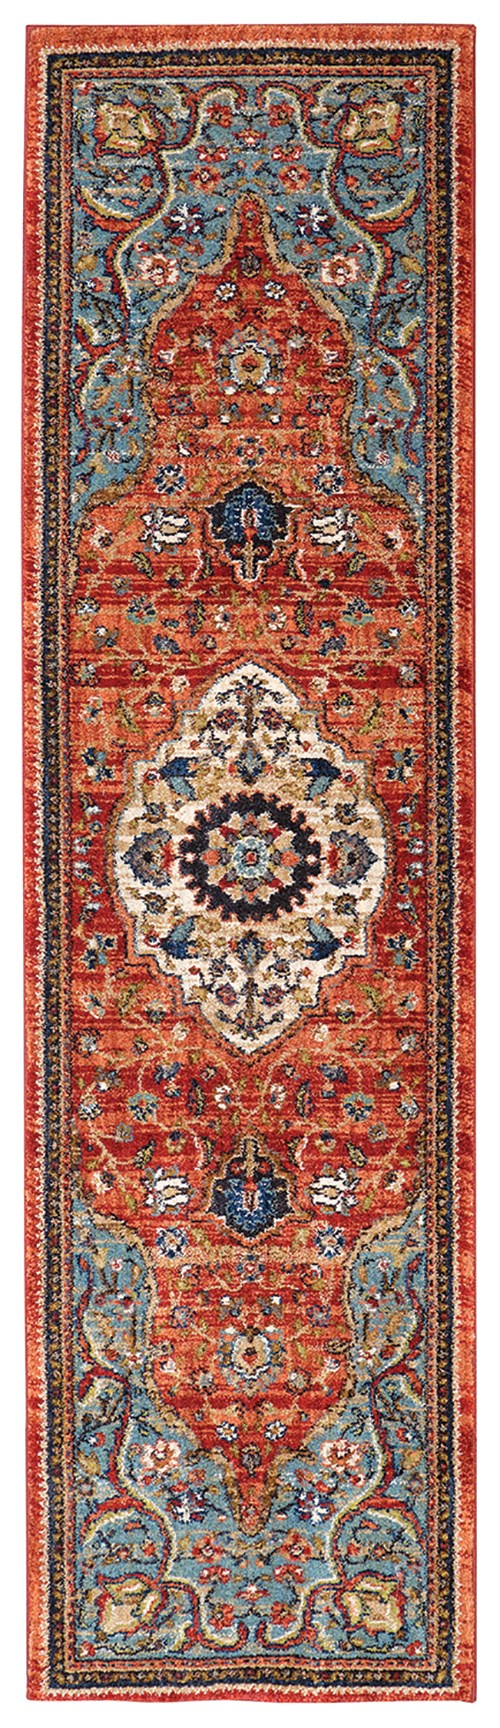 Karastan Spice Market Petra Rugs Rugs Direct